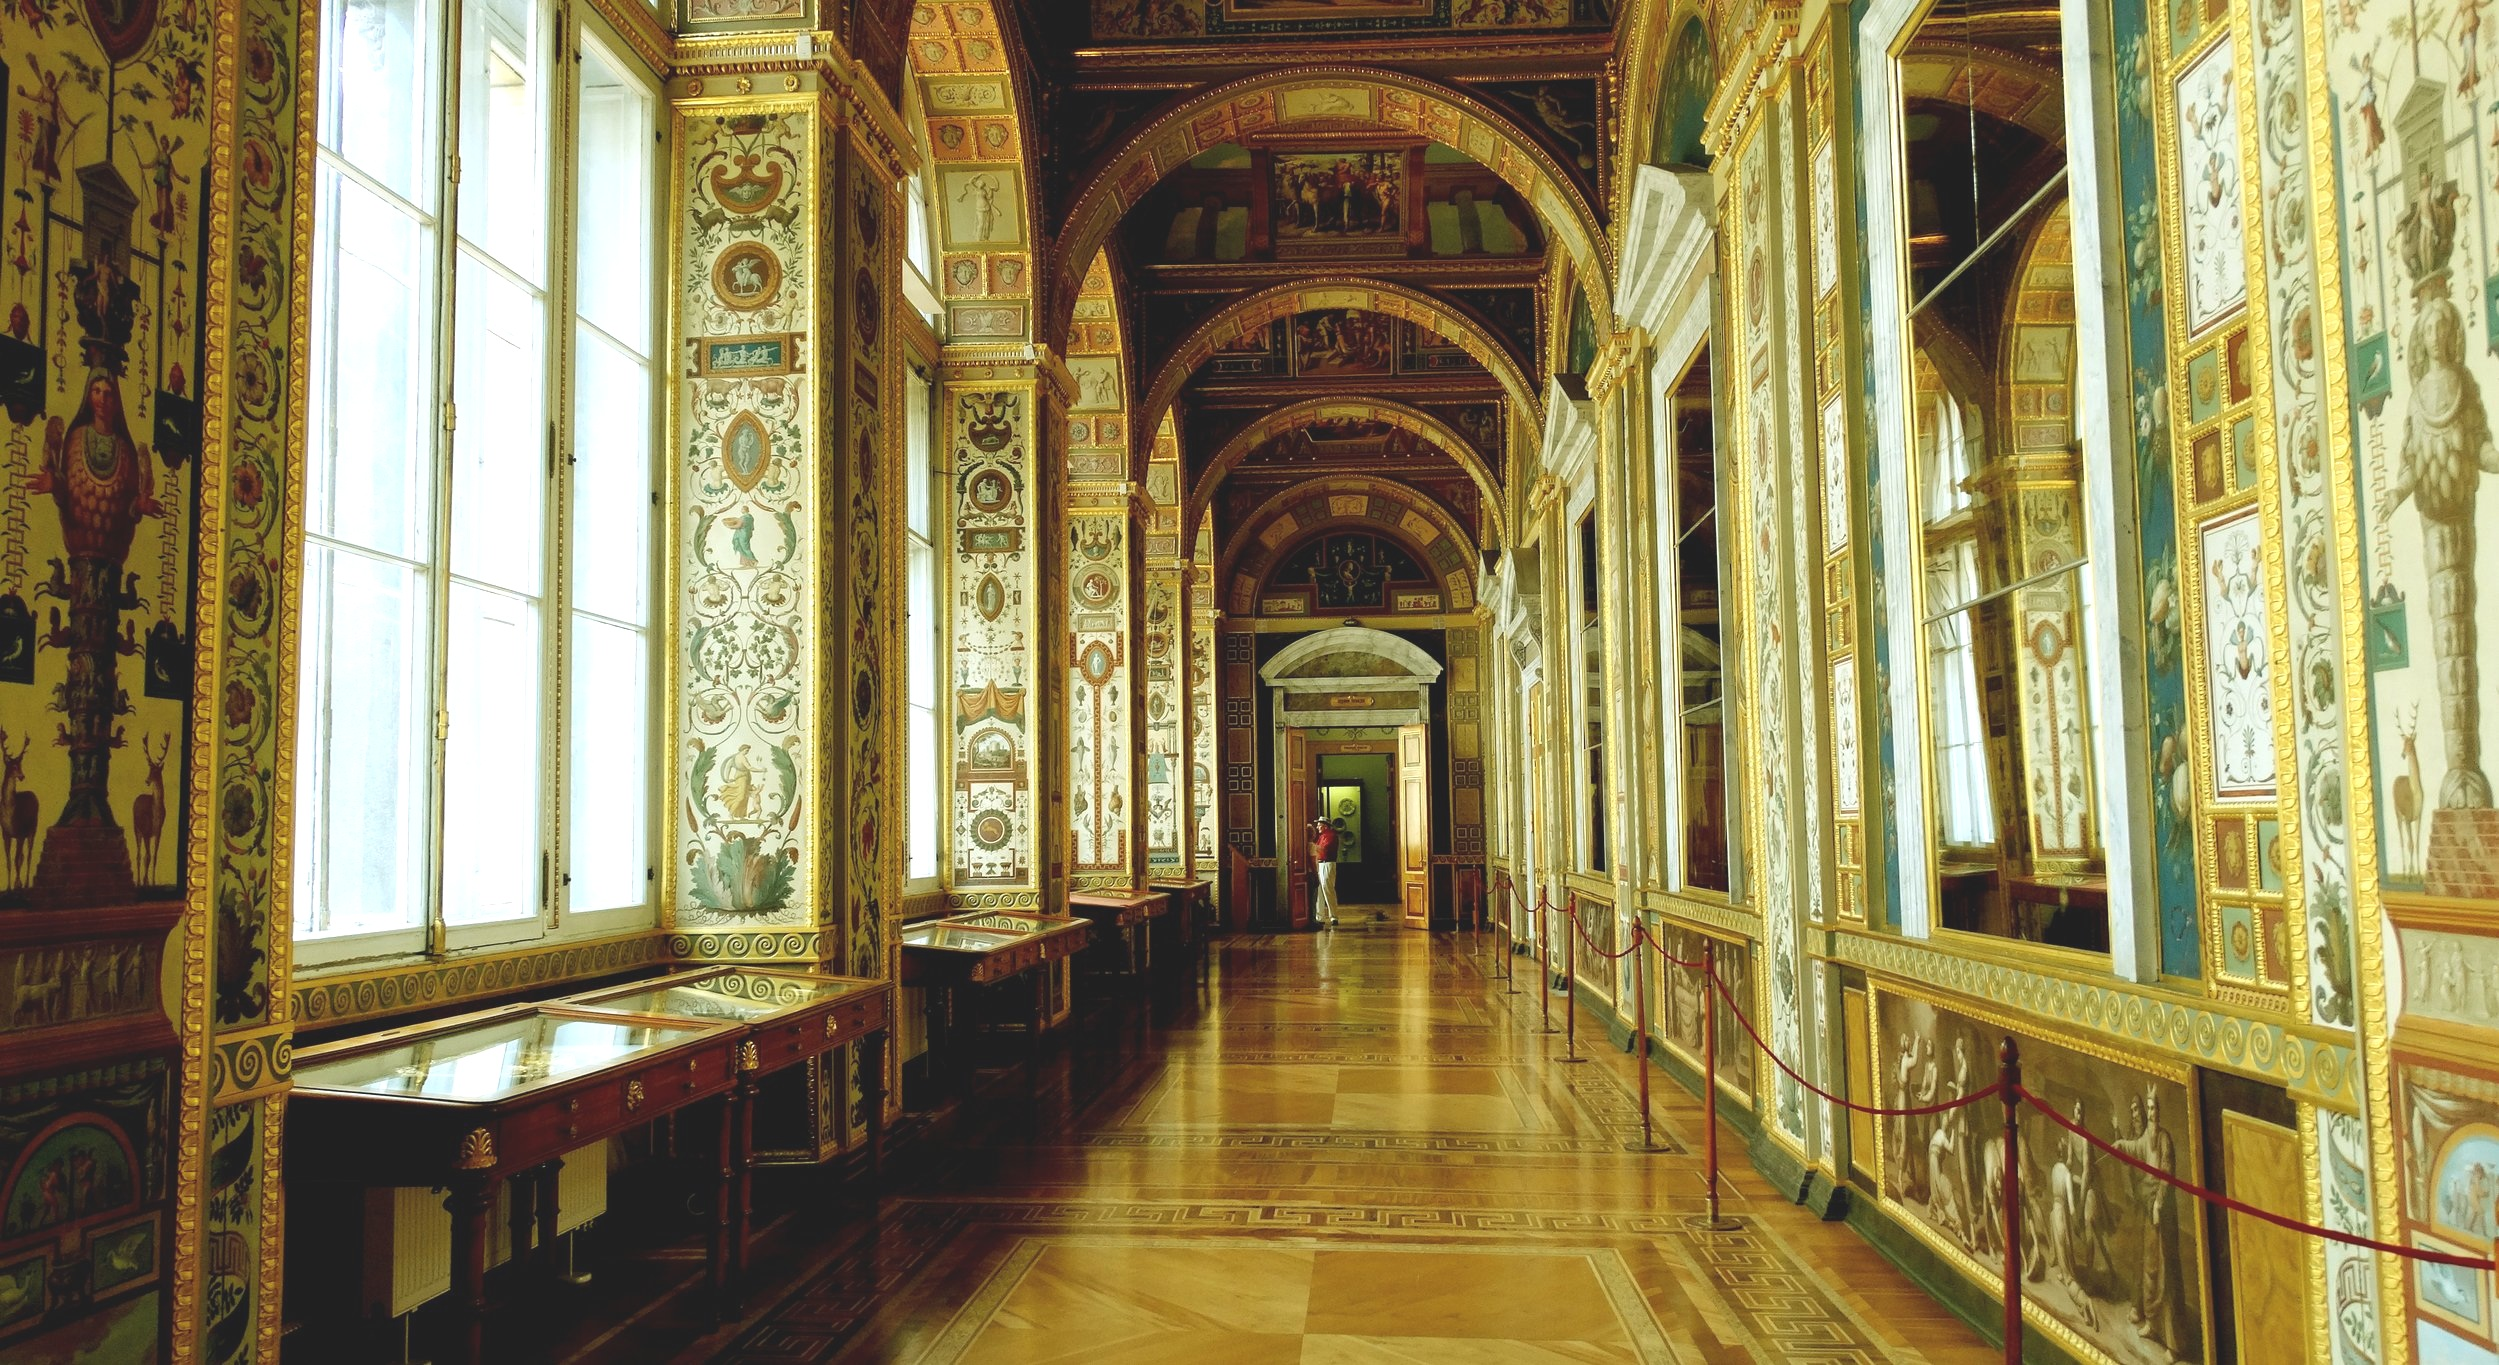 Russia_-_St._Petersburg,_Hermitage_Museum_-_panoramio_(14).jpg